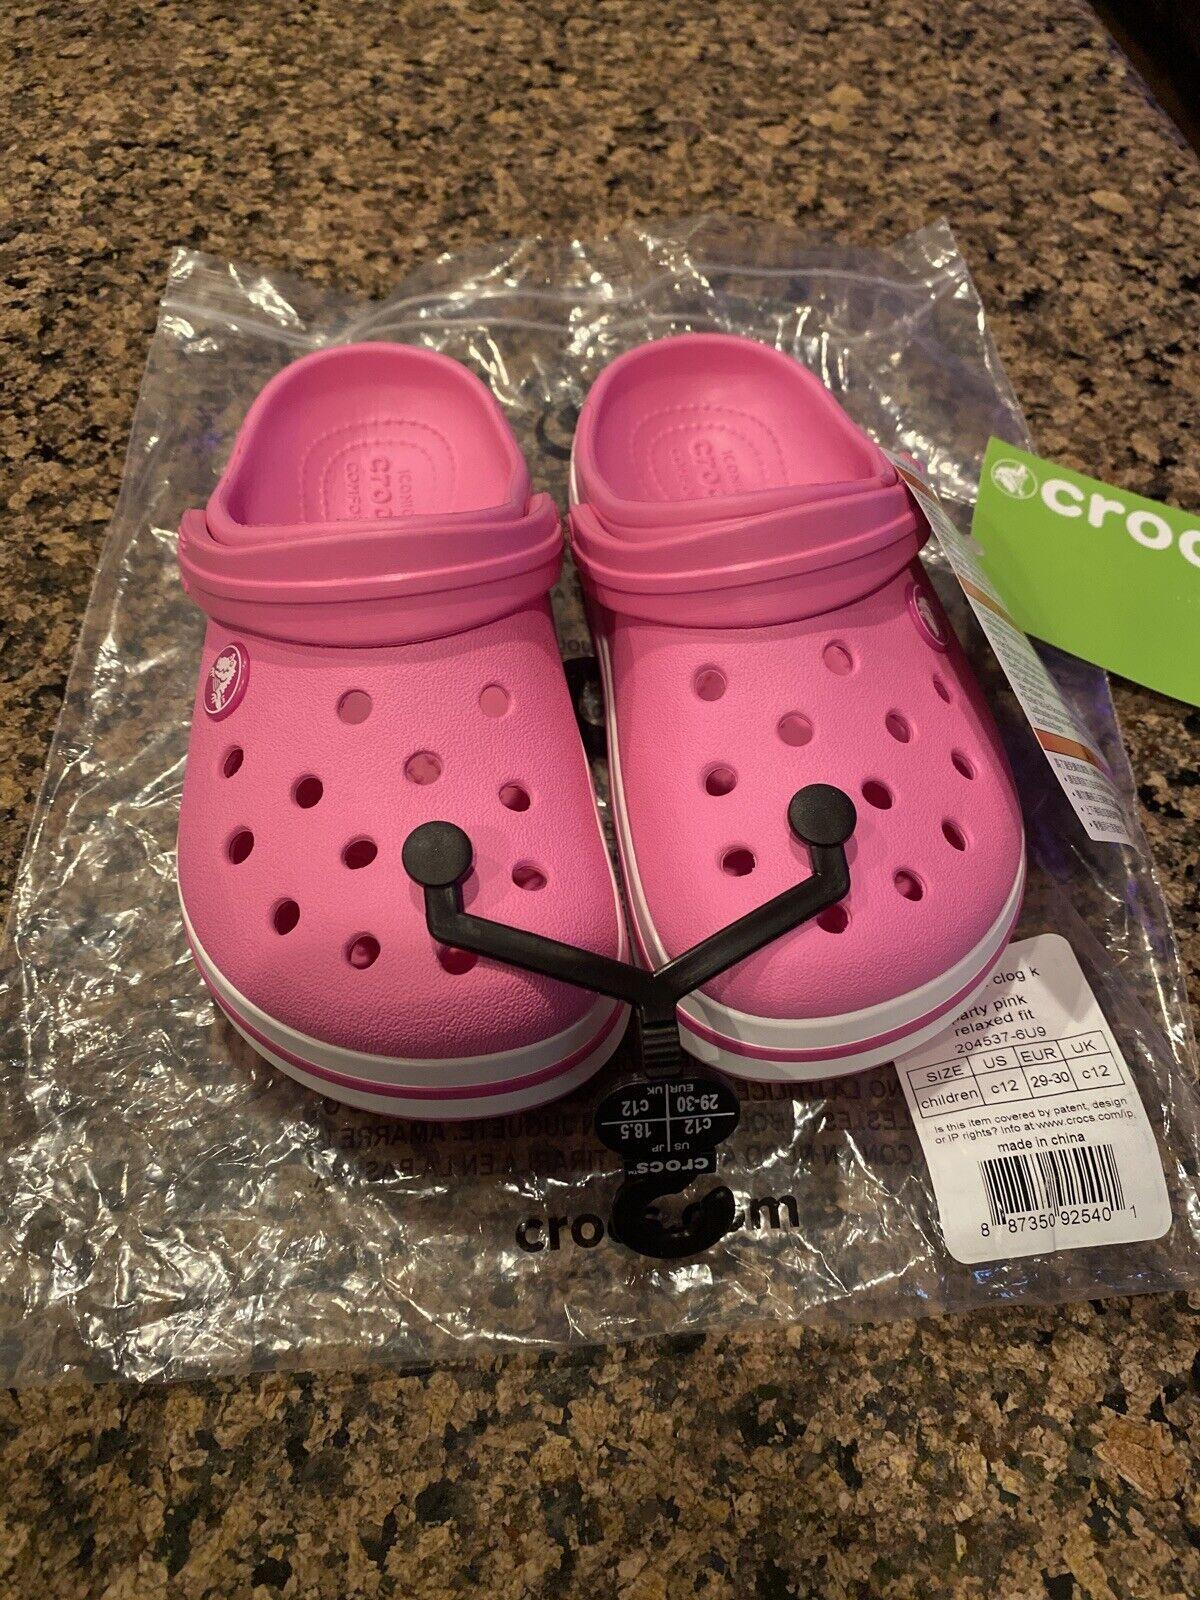 Party Pink 6 Children Crocs Kids Crocband Clog